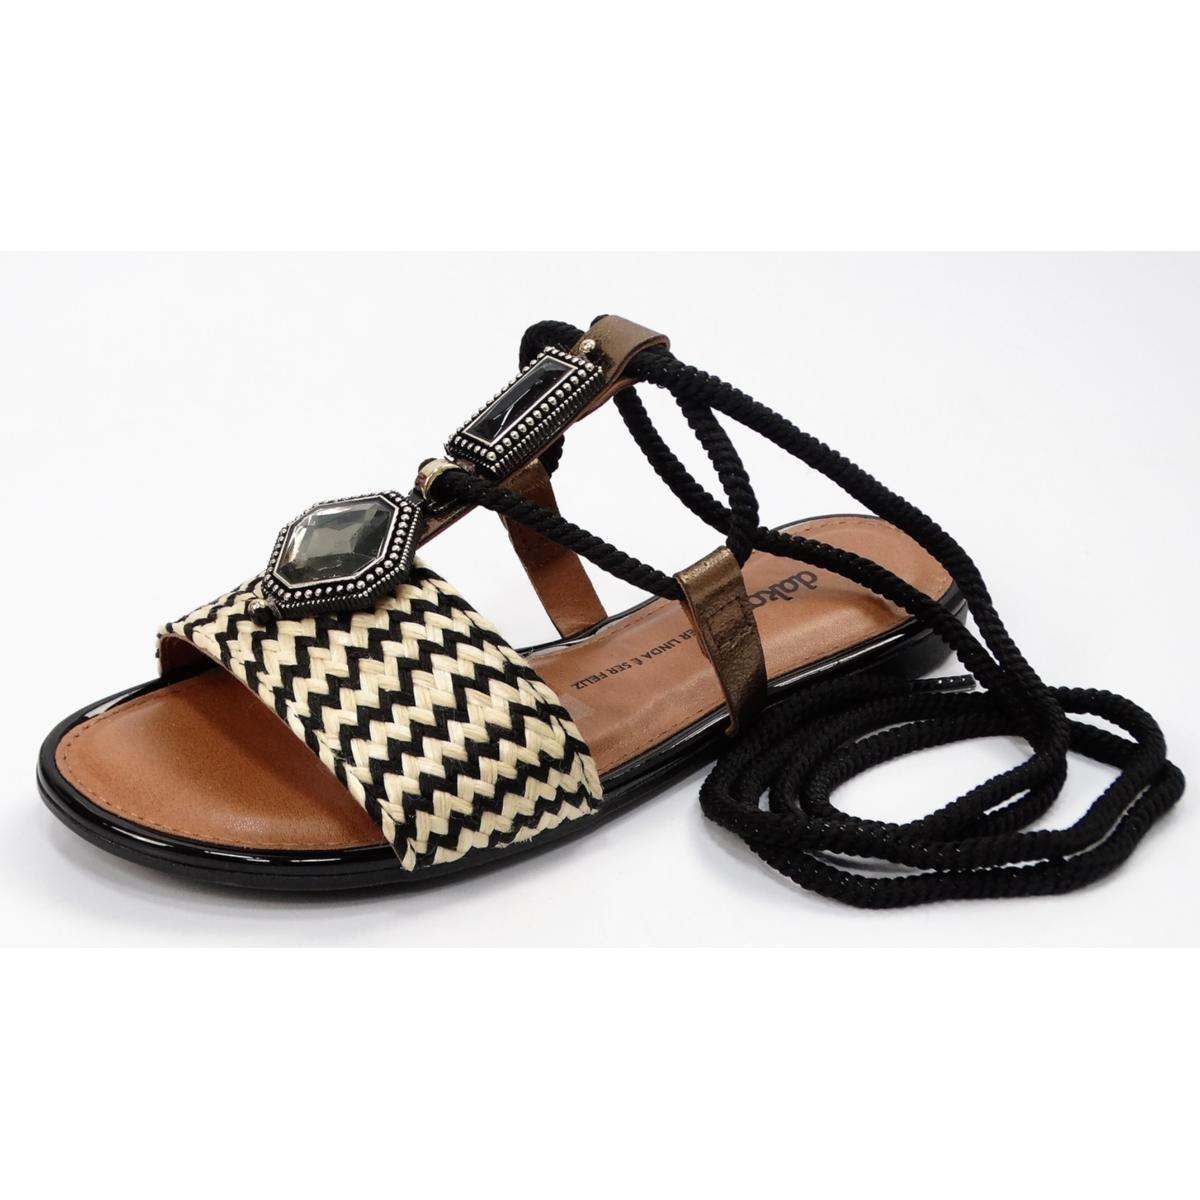 Sandalia Dakota Preto/Bege Feminino Z5901